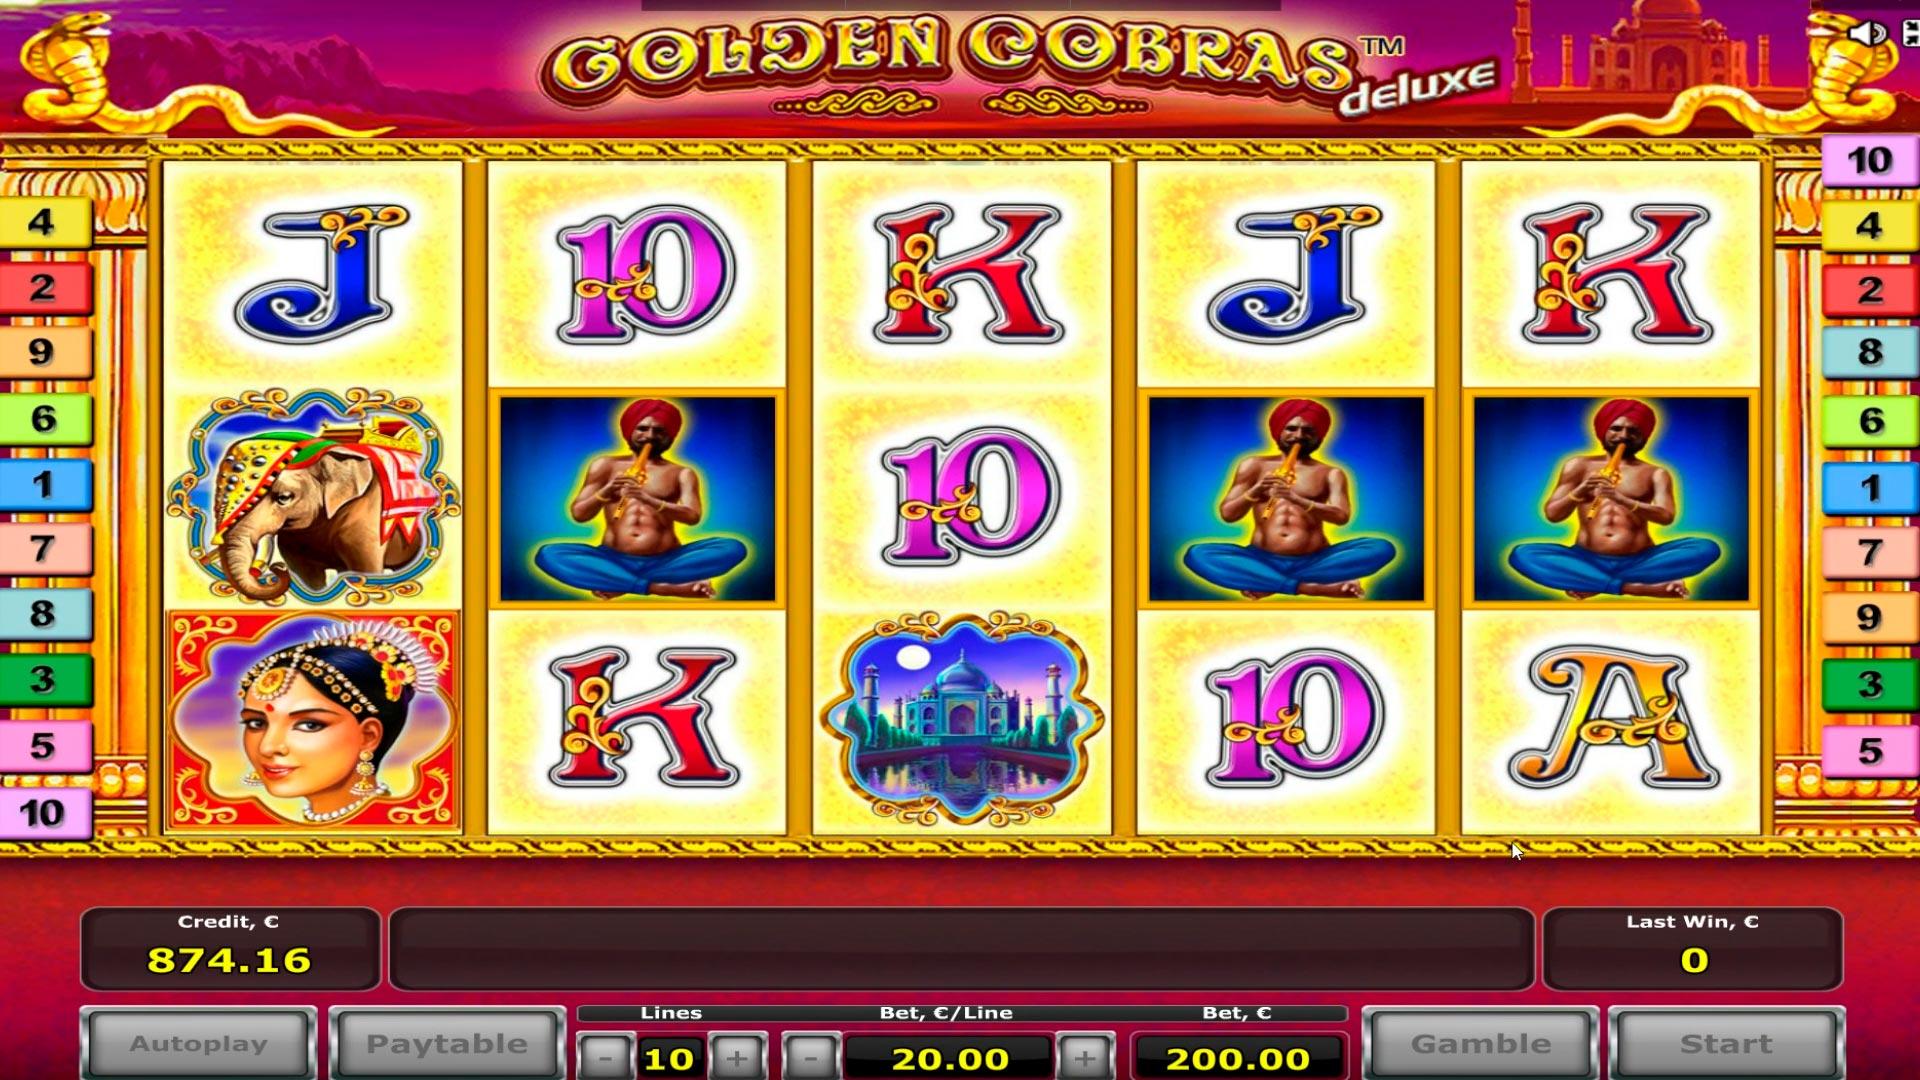 Golden Cobras online casino slot büyük galibiyet - € 18.000